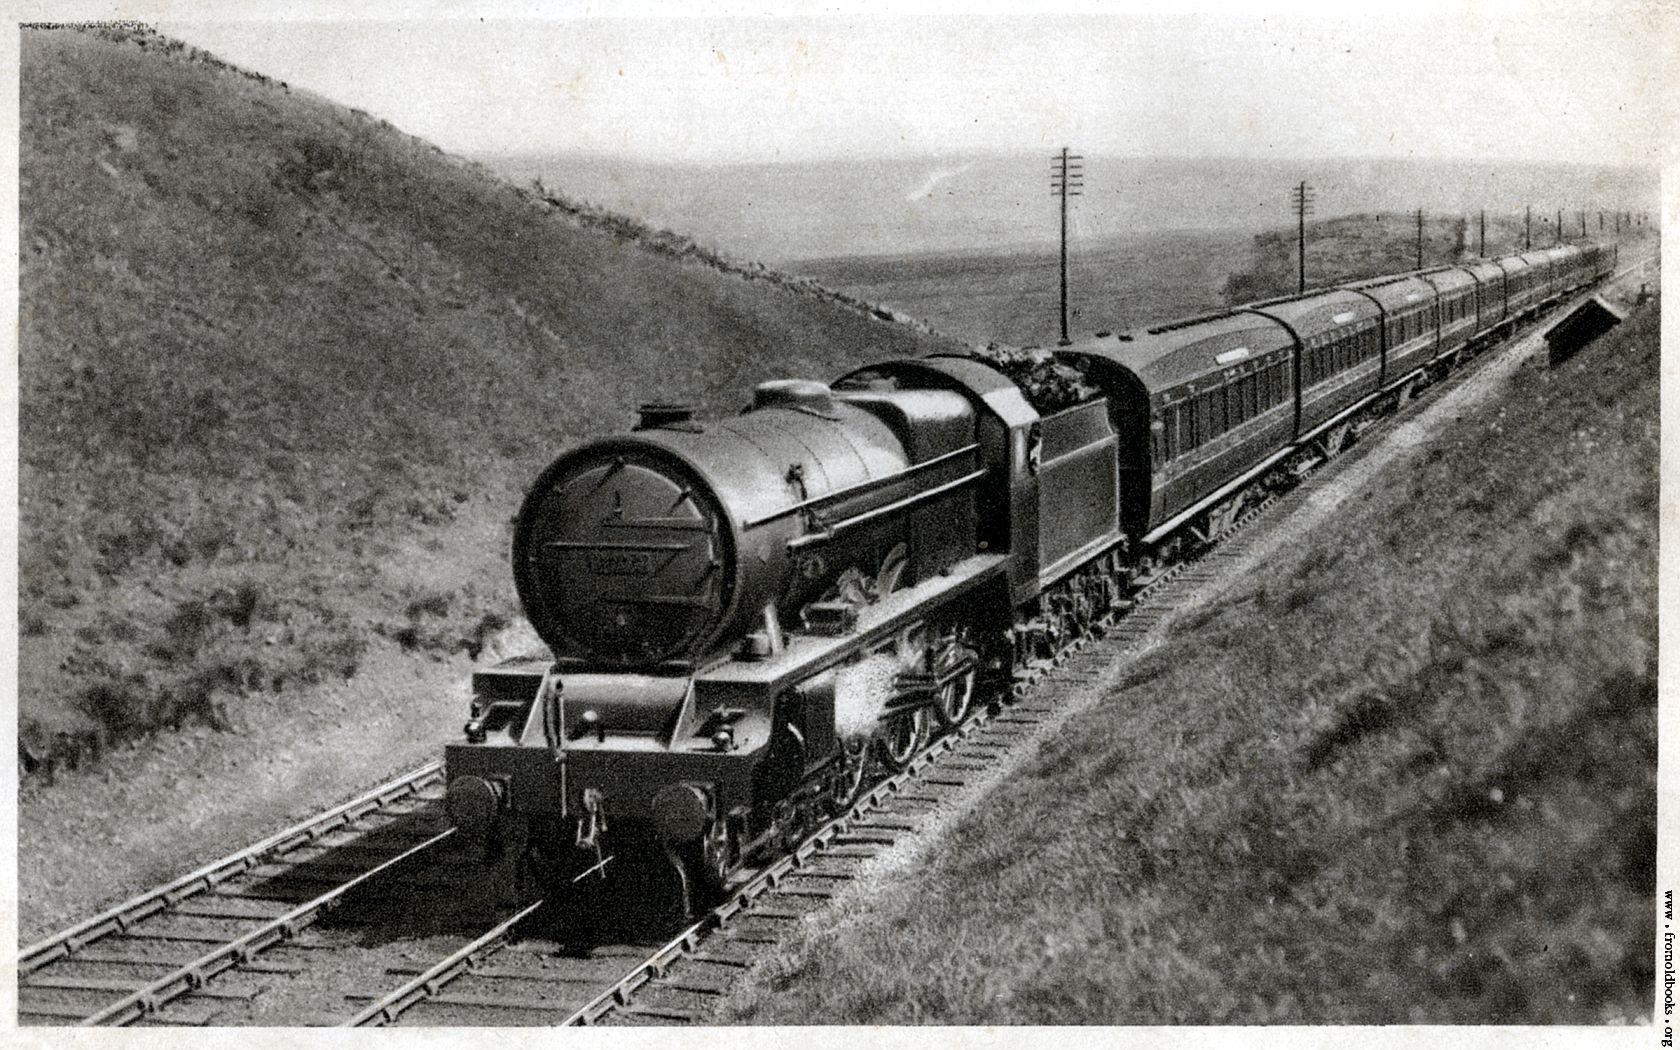 fqniz5flbpwx3qmb old steam train pictures   1680x1050 370K jpg free download